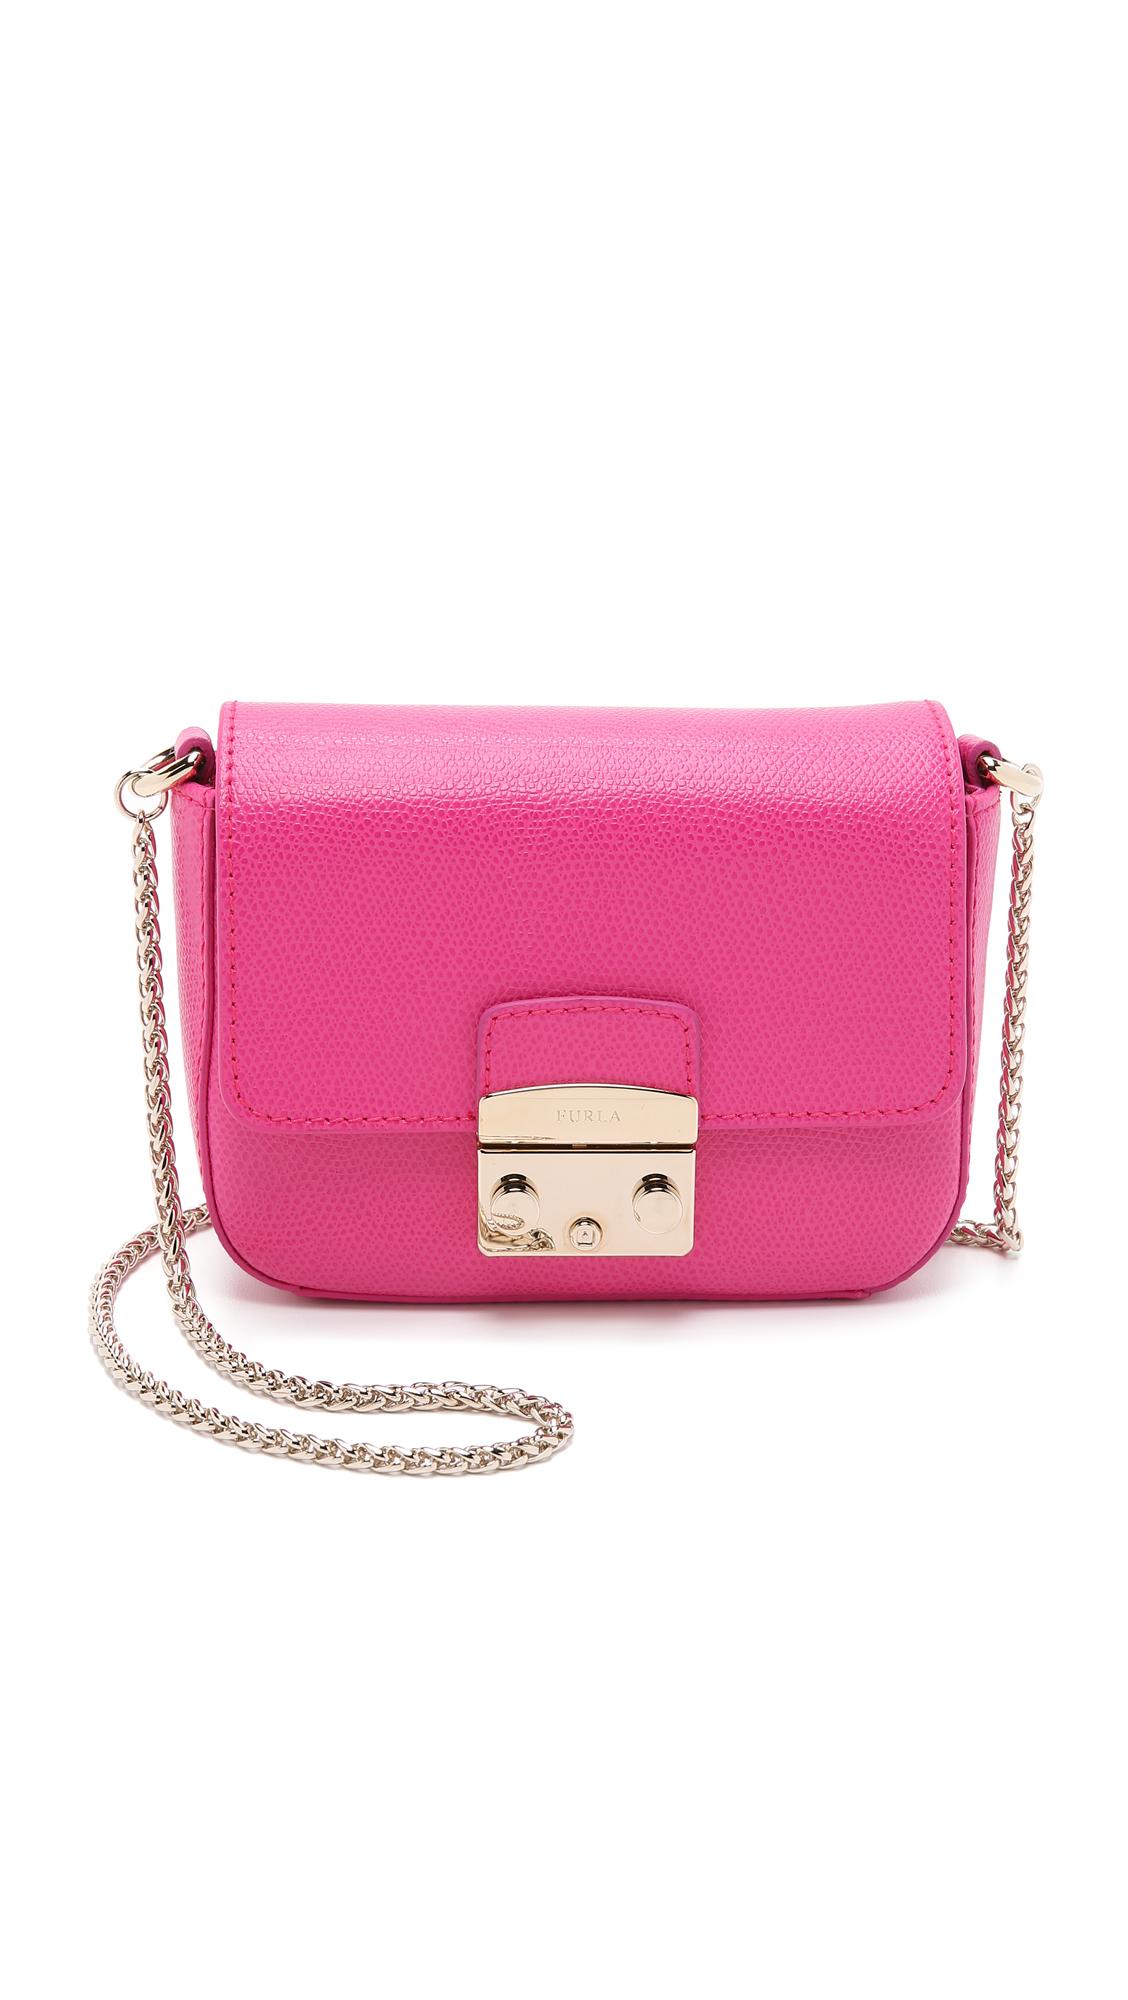 lyst furla metropolis mini cross body bag pinky in pink. Black Bedroom Furniture Sets. Home Design Ideas